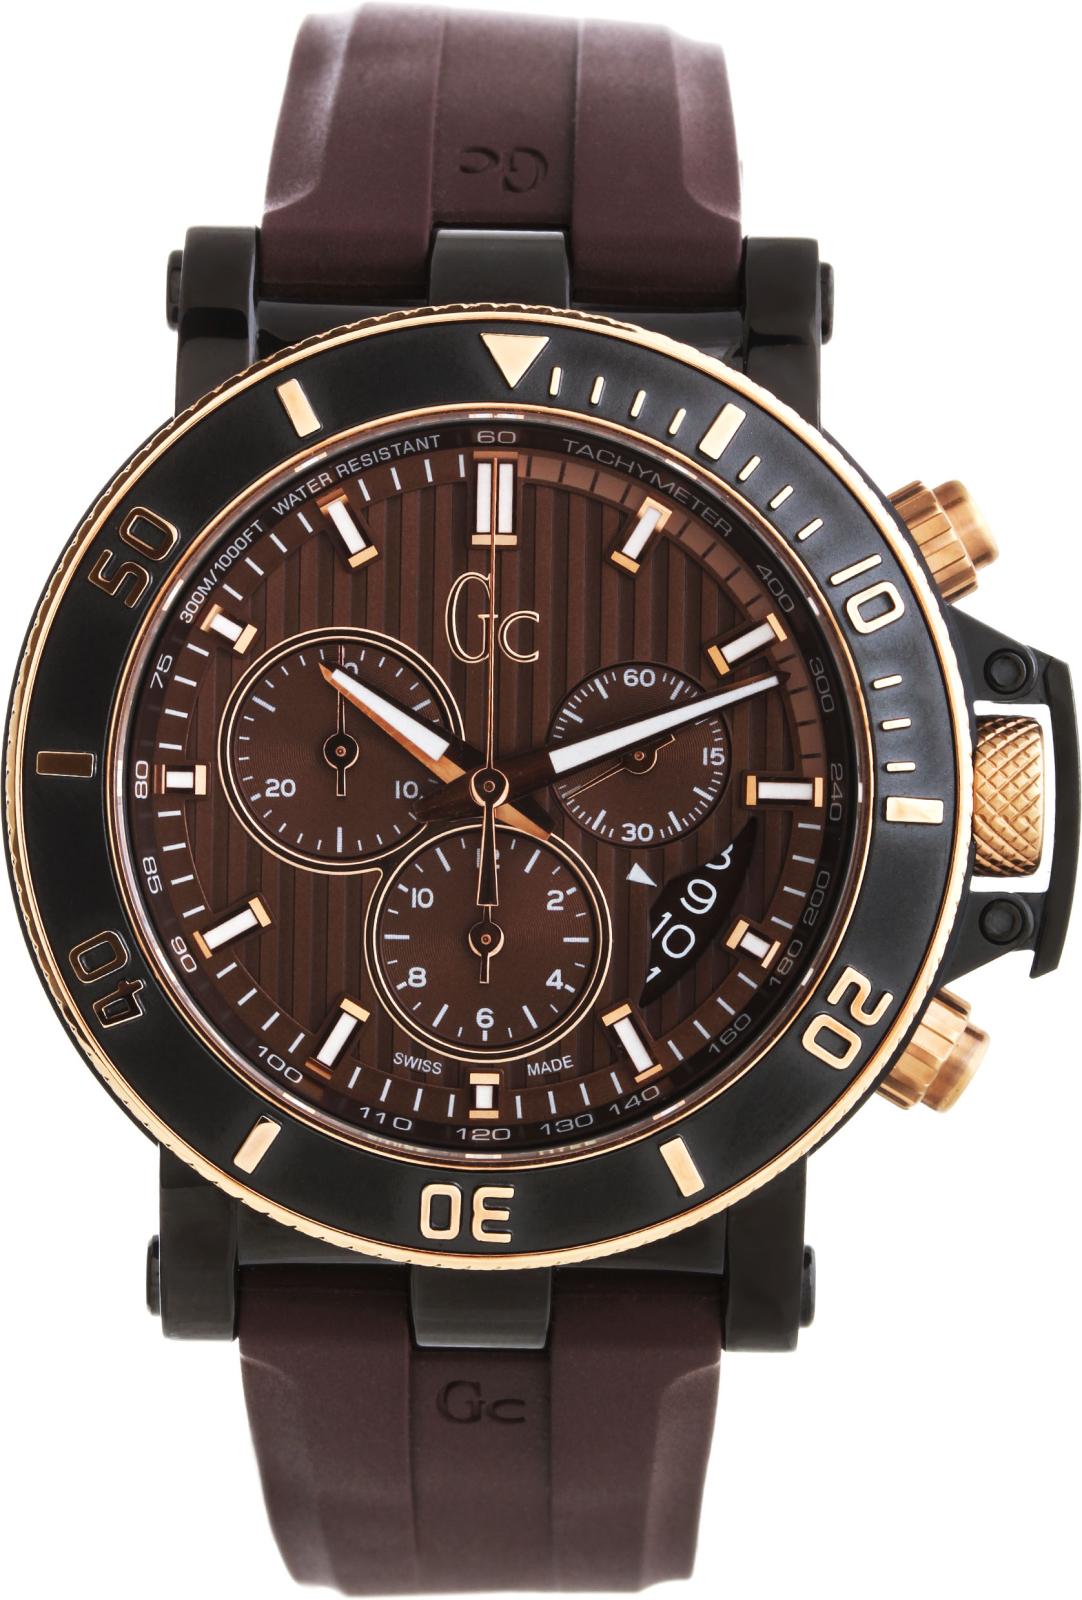 GC Sport Chic X95004G4SНаручные часы<br>Швейцарские часы GC Sport Chic X95004G4S<br><br>Пол: Мужские<br>Страна-производитель: Швейцария<br>Механизм: Кварцевый<br>Материал корпуса: Сталь<br>Материал ремня/браслета: Каучук<br>Водозащита, диапазон: 200 - 800 м<br>Стекло: Сапфировое<br>Толщина корпуса: 13 мм<br>Стиль: Спорт